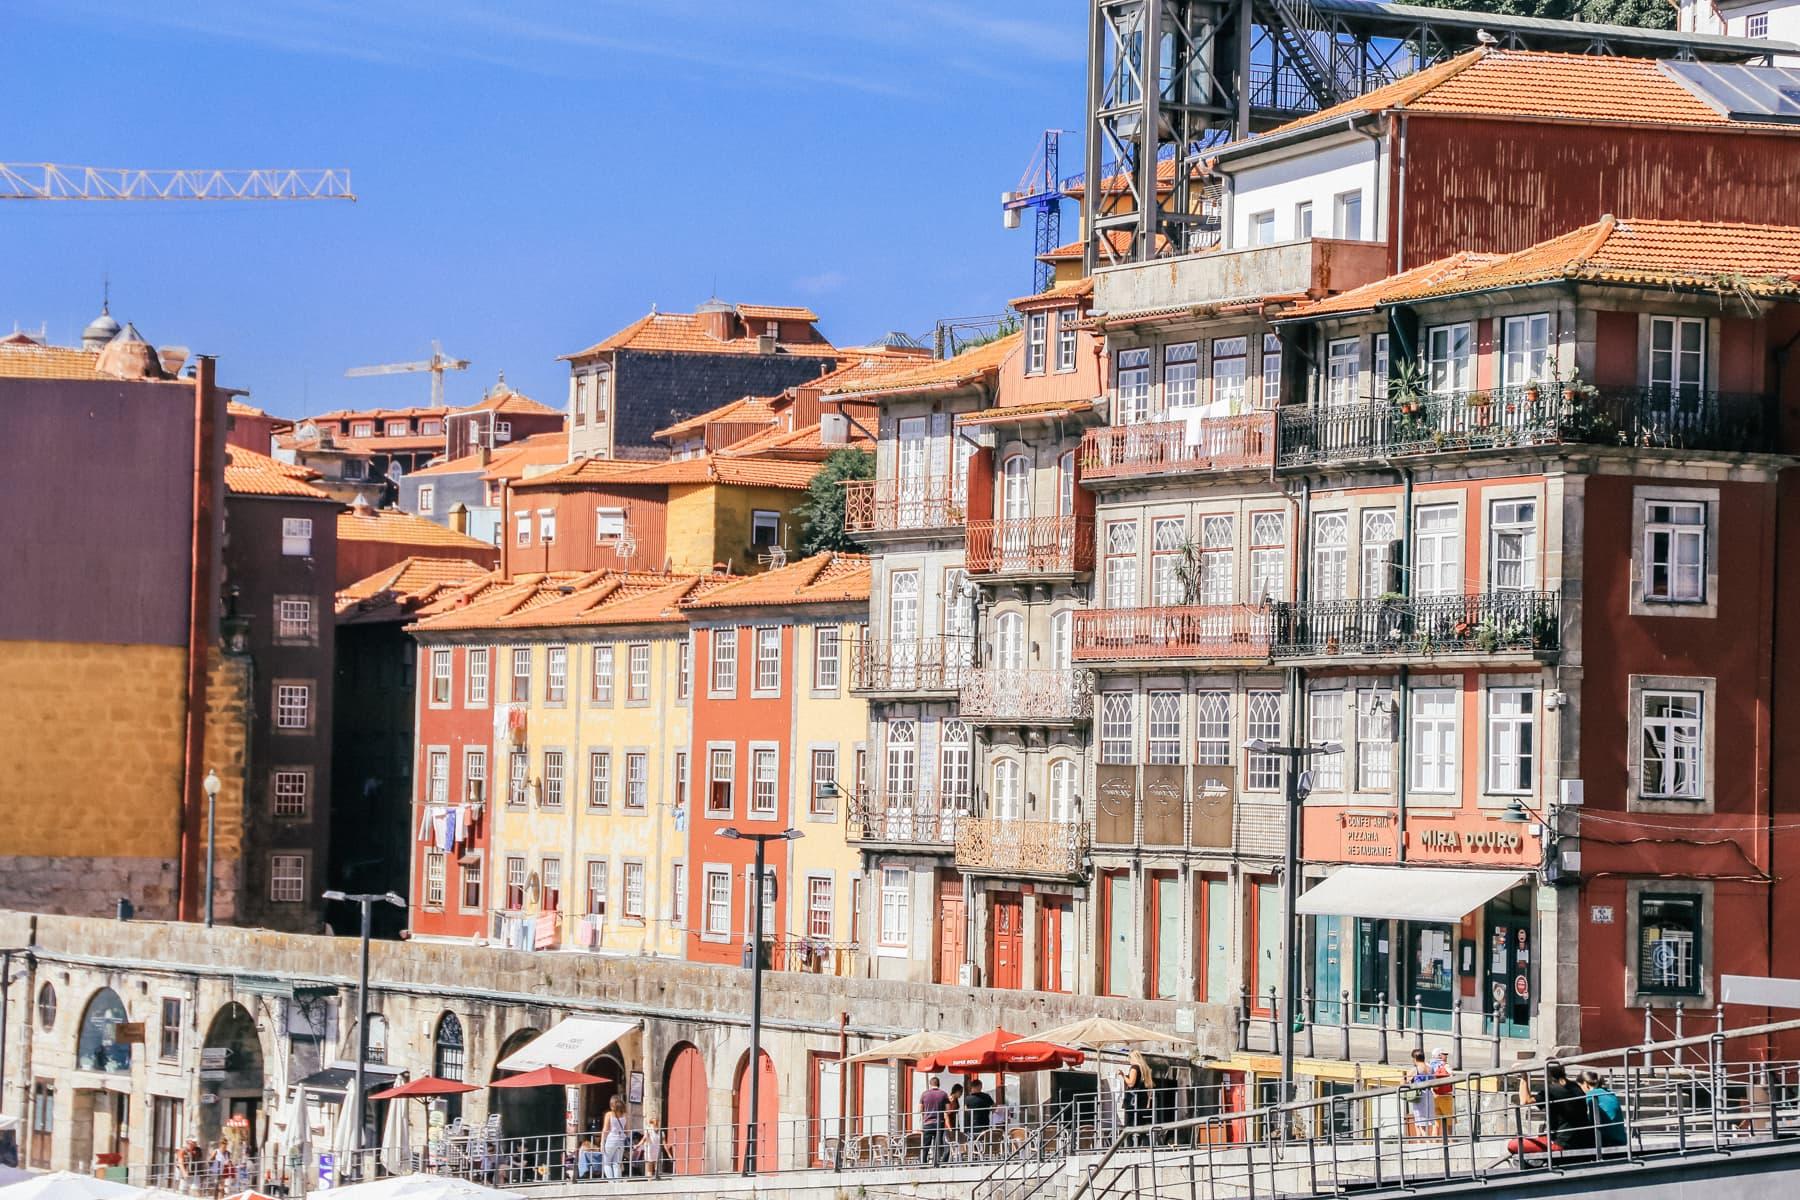 zehn-porto-tipps-fuer-deine-staedtereise-in-portugal-reiseblog-des-belles-choses 53